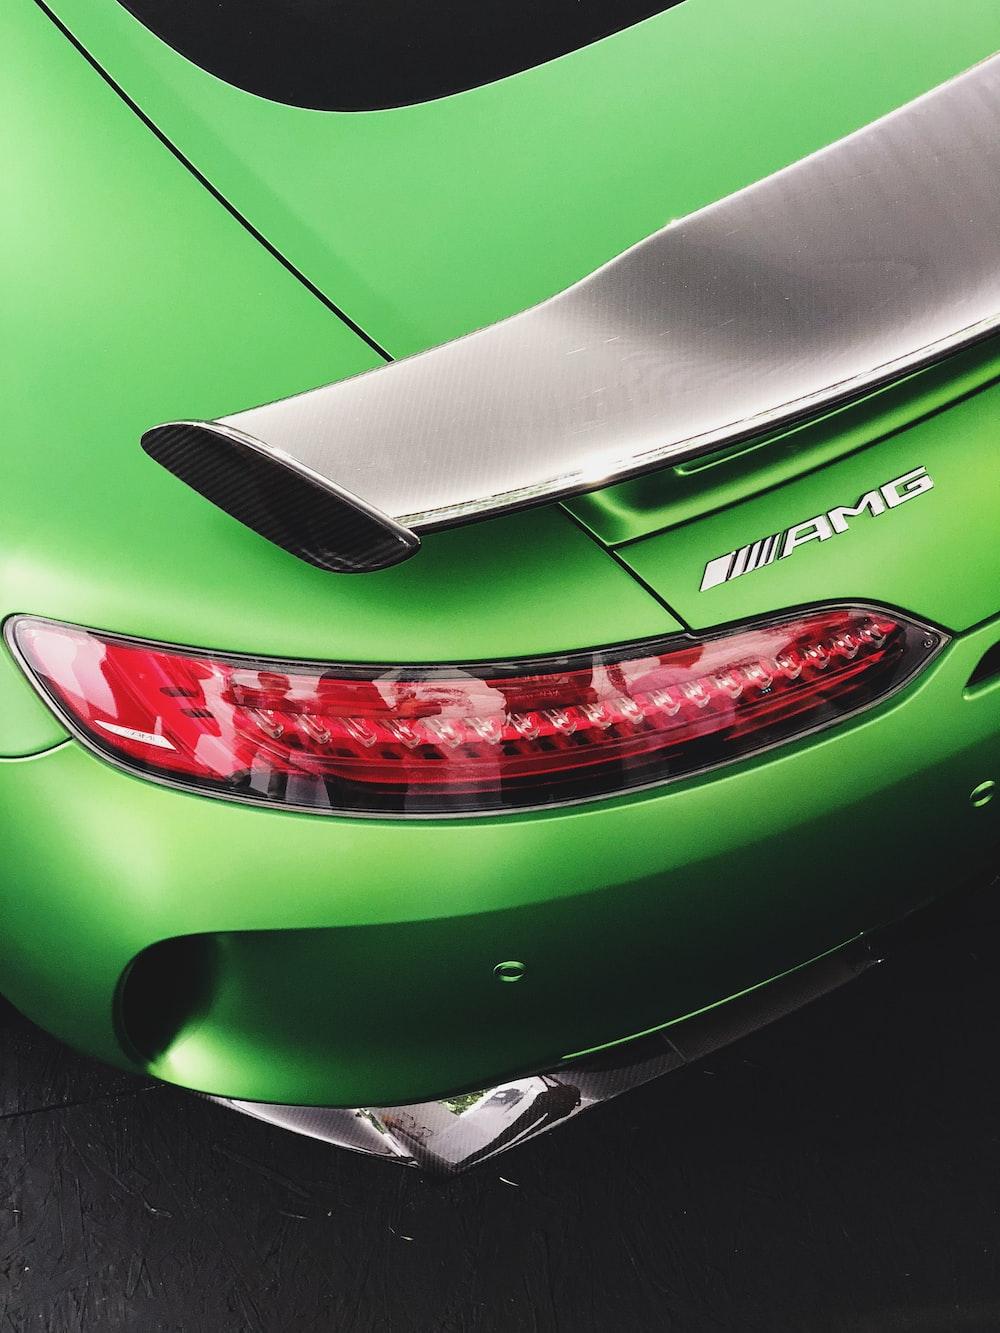 green porsche 911 parked on gray pavement